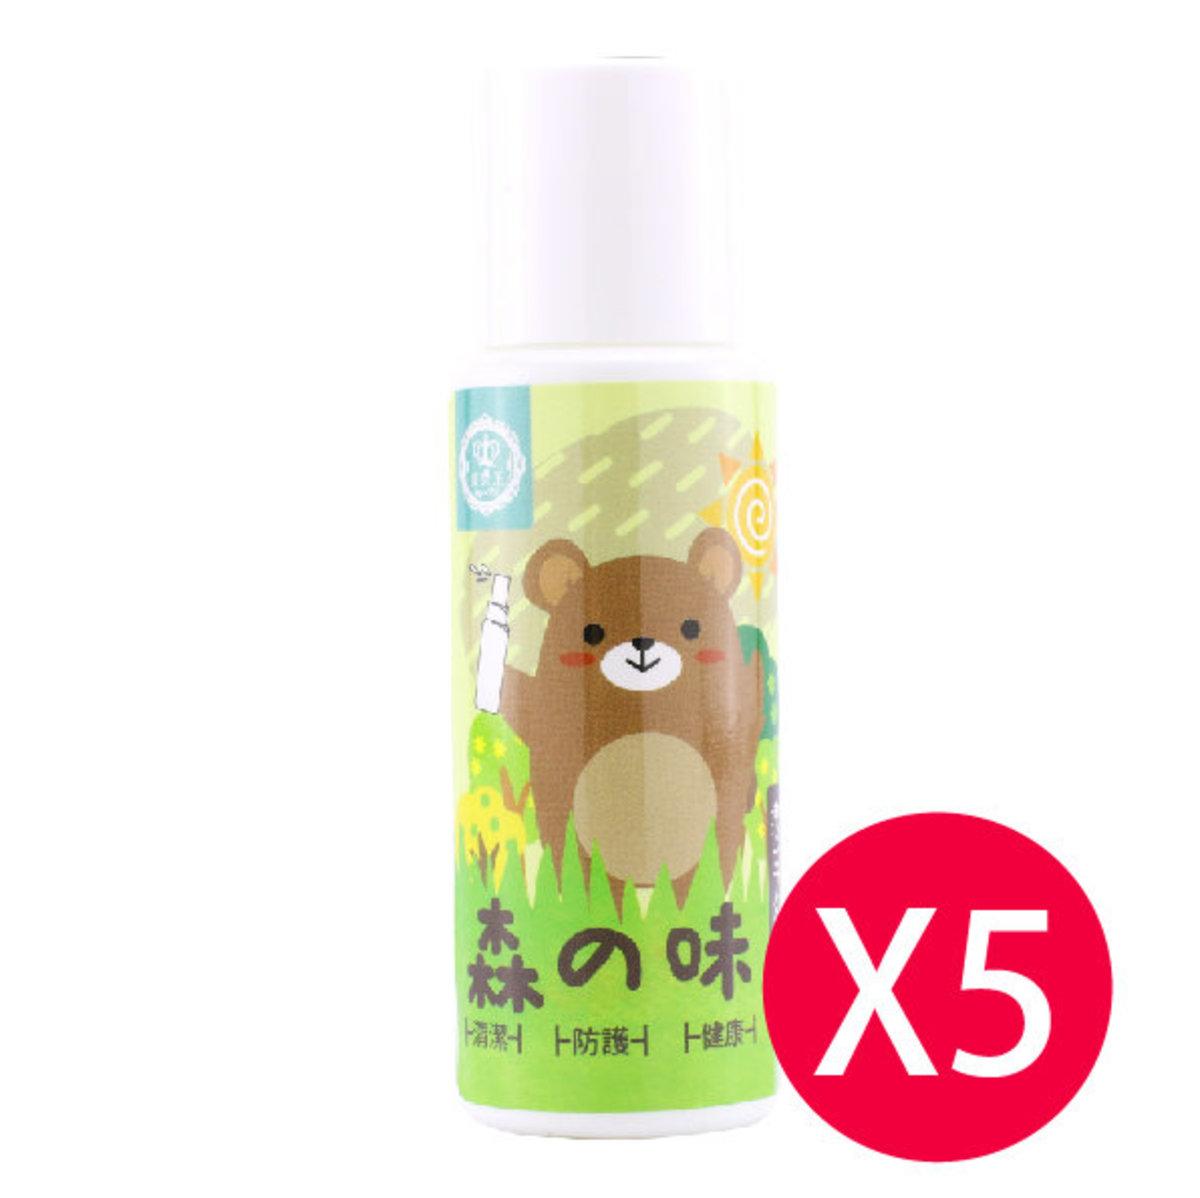 5X 森之味(60ml)消毒酒精殺菌搓手液(5支)